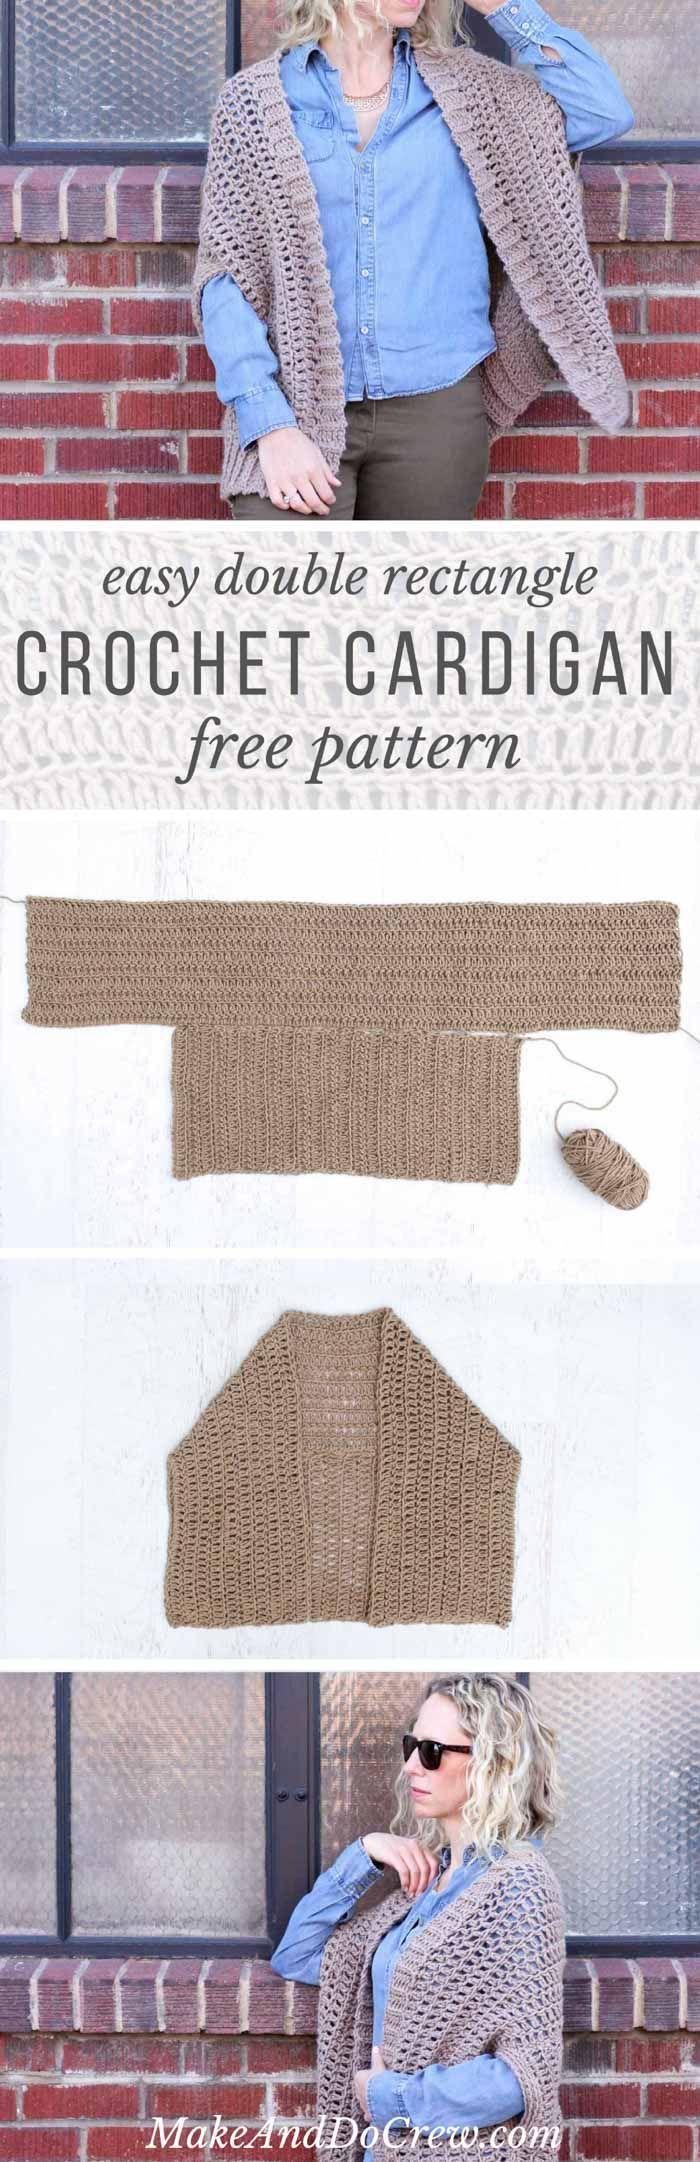 Cocoon Cardigan Free Crochet Pattern   Sacos y Tejido